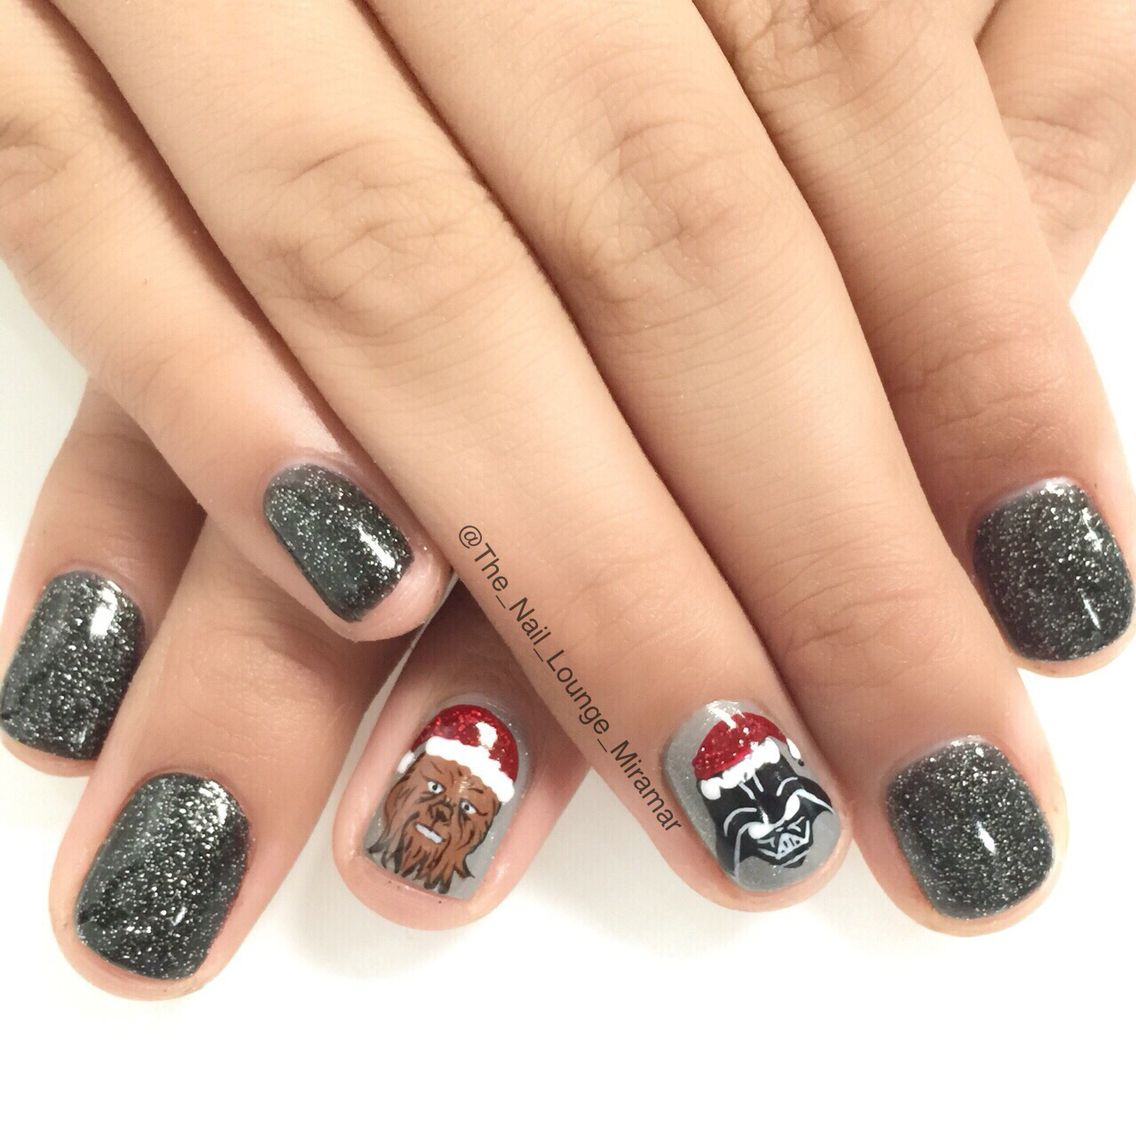 May the force be with you star wars Christmas nail art design | Nail ...